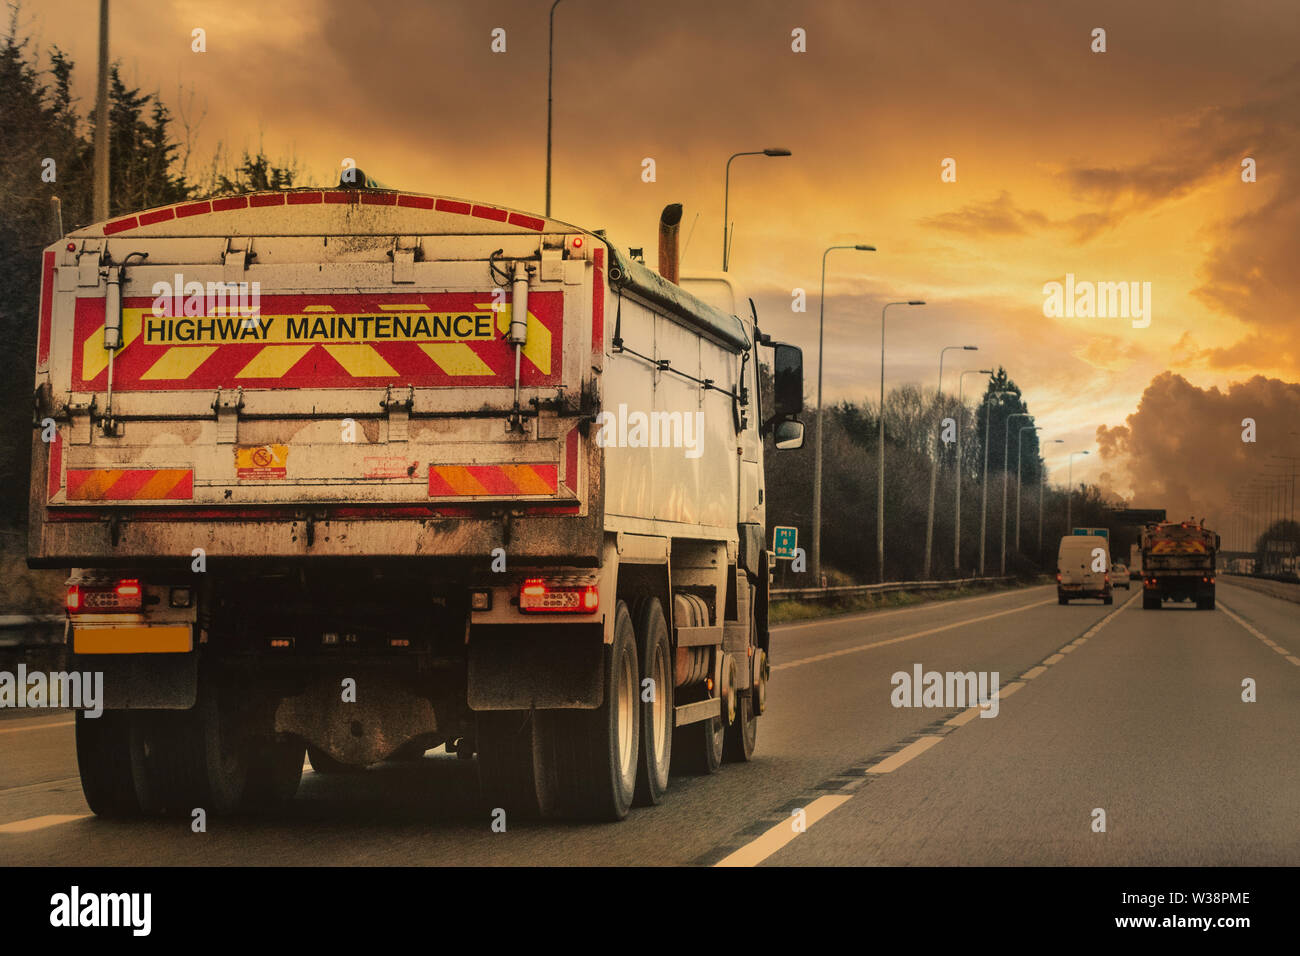 Construcción camión/VHG transportar mercancías a través de la nación Foto de stock